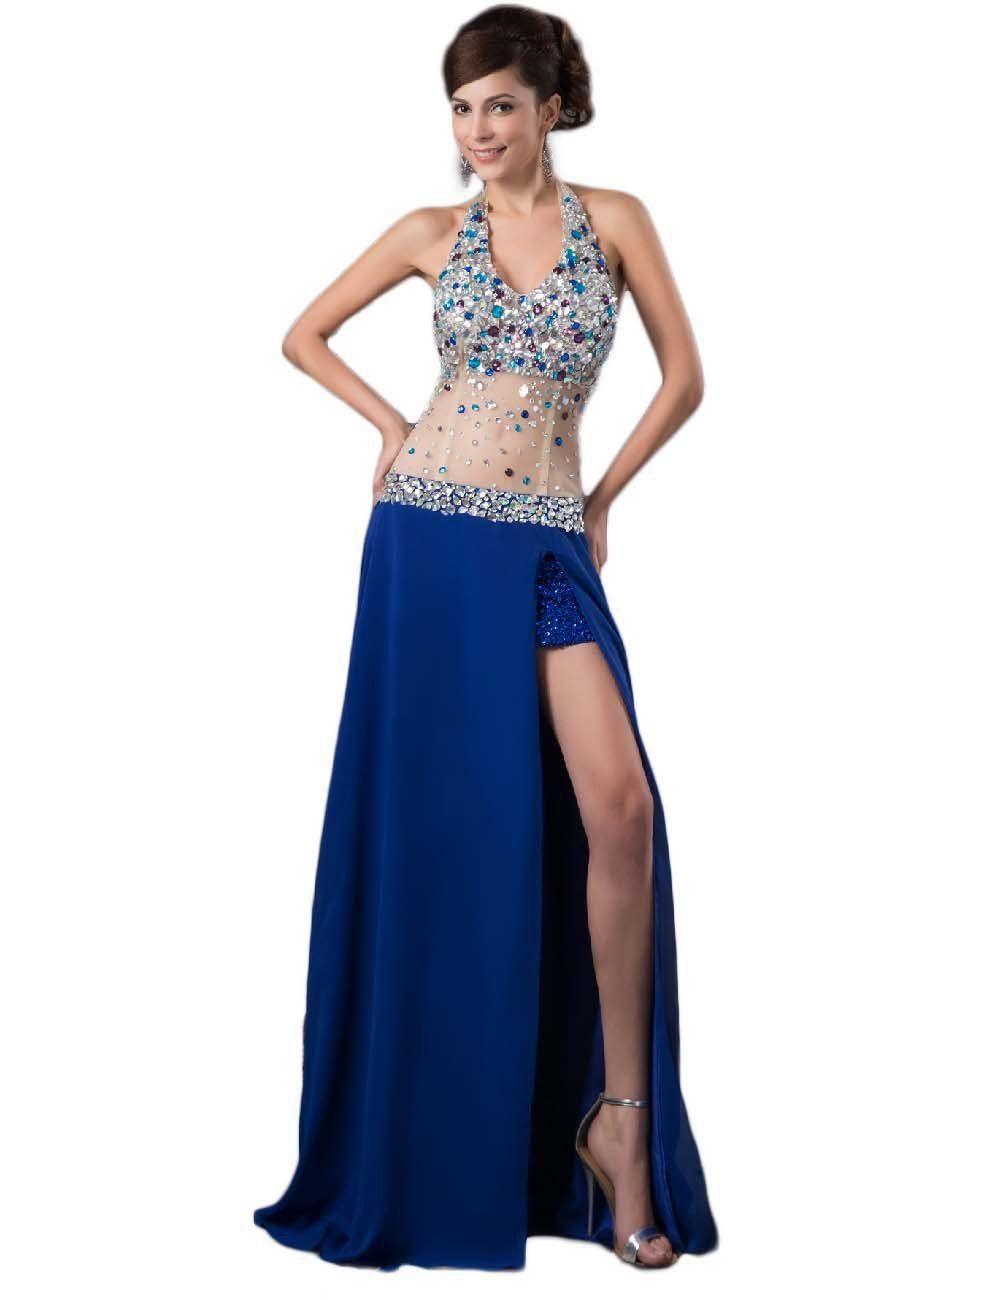 Fnina womenus sexy high slit beaded prom dress halter gown size